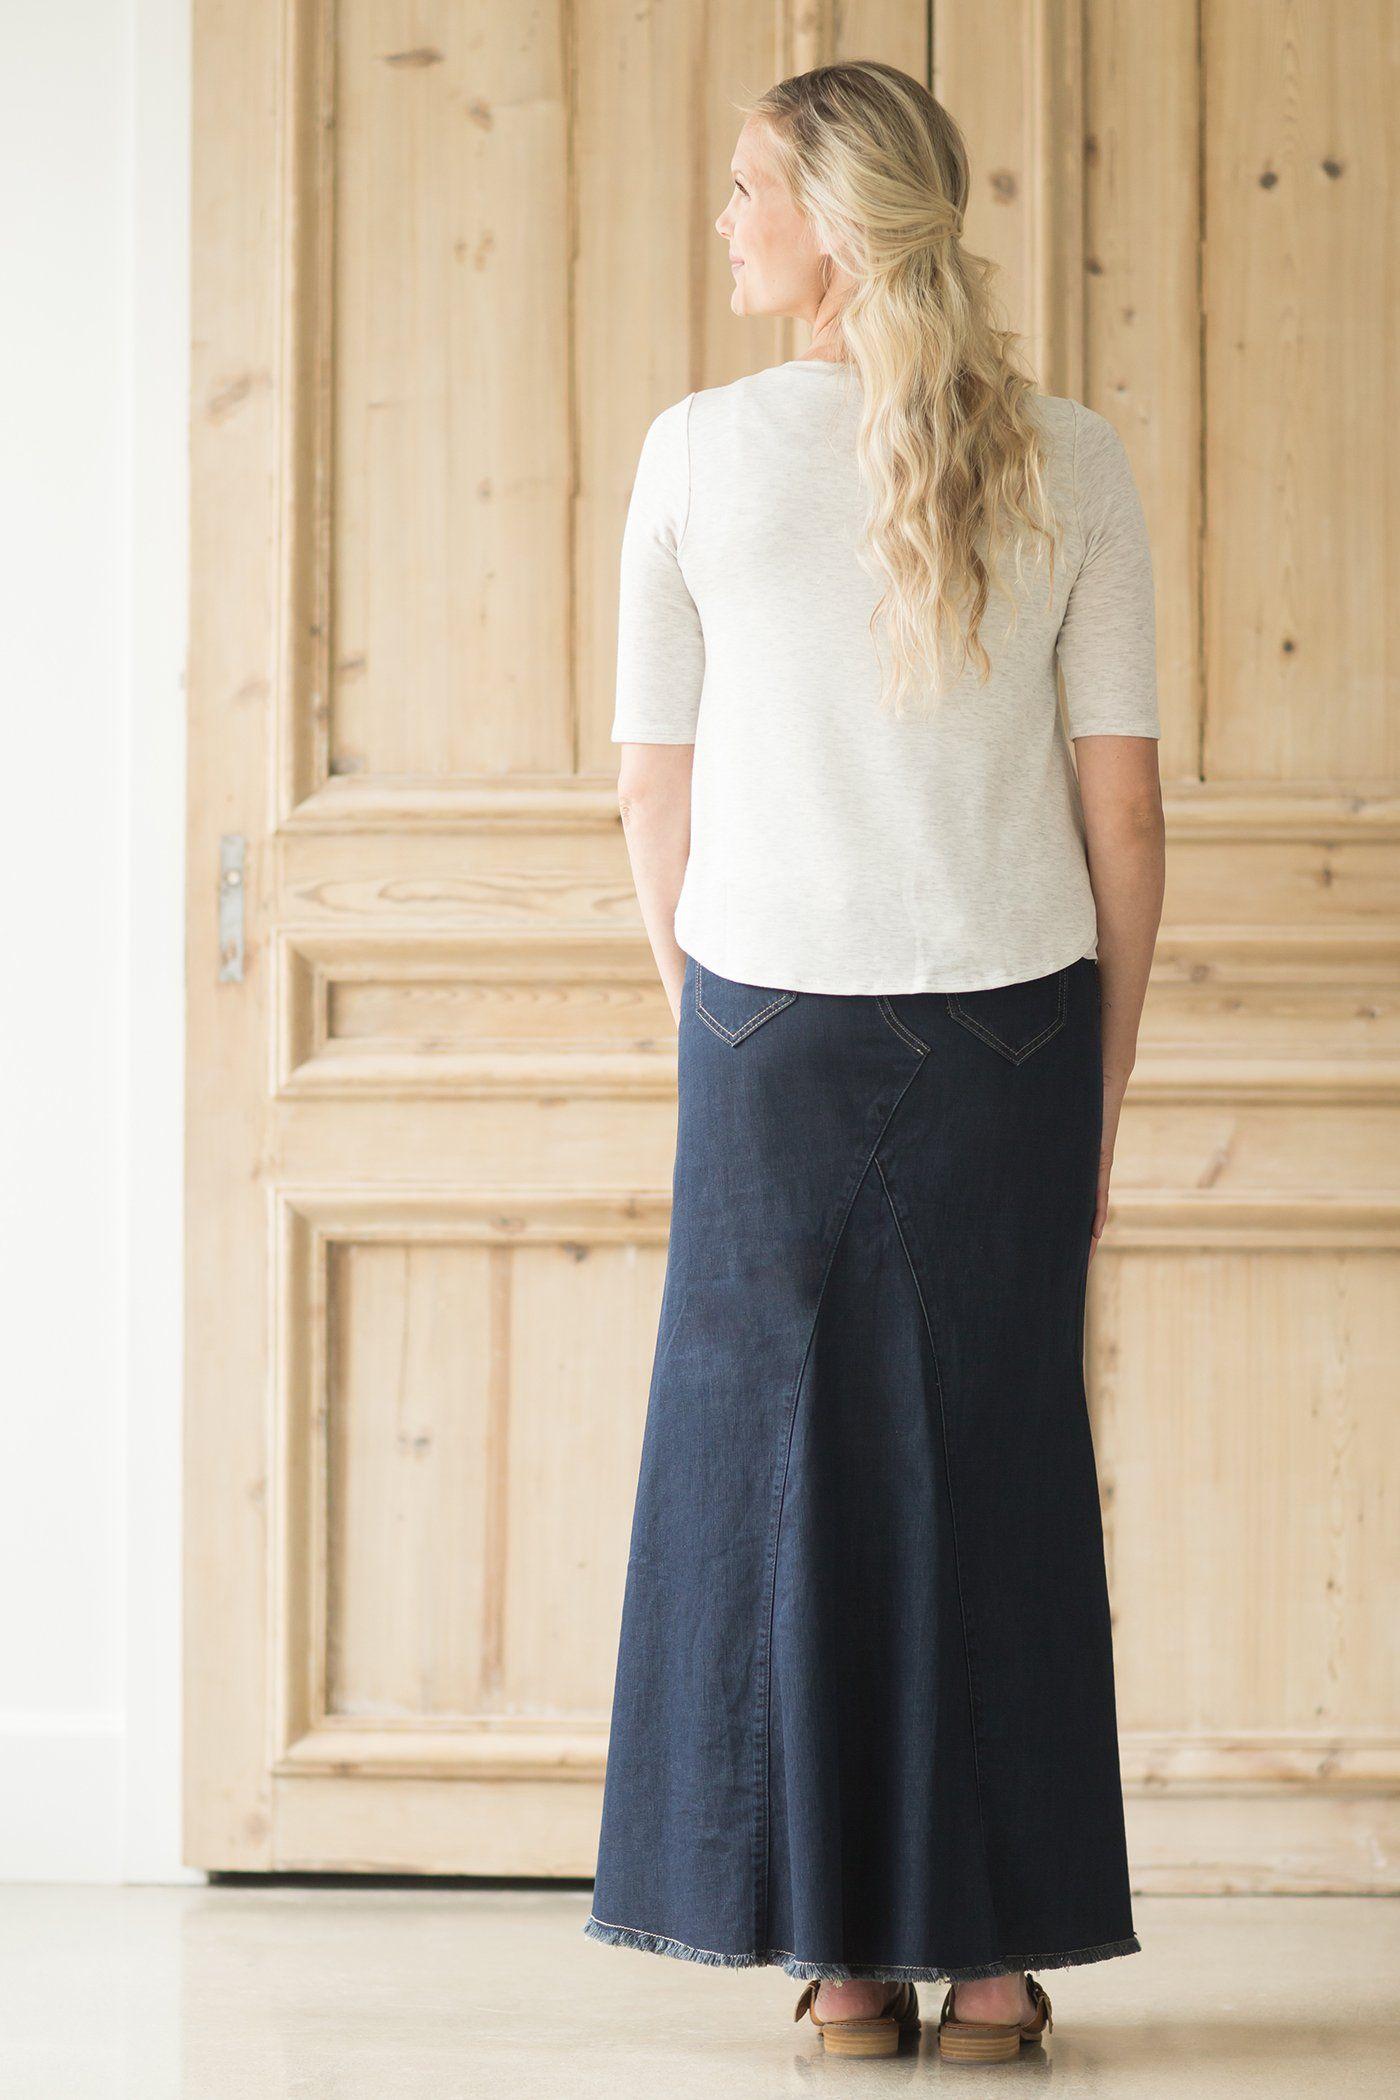 a60b9949ffc37 Maternity Skirts Long – DACC